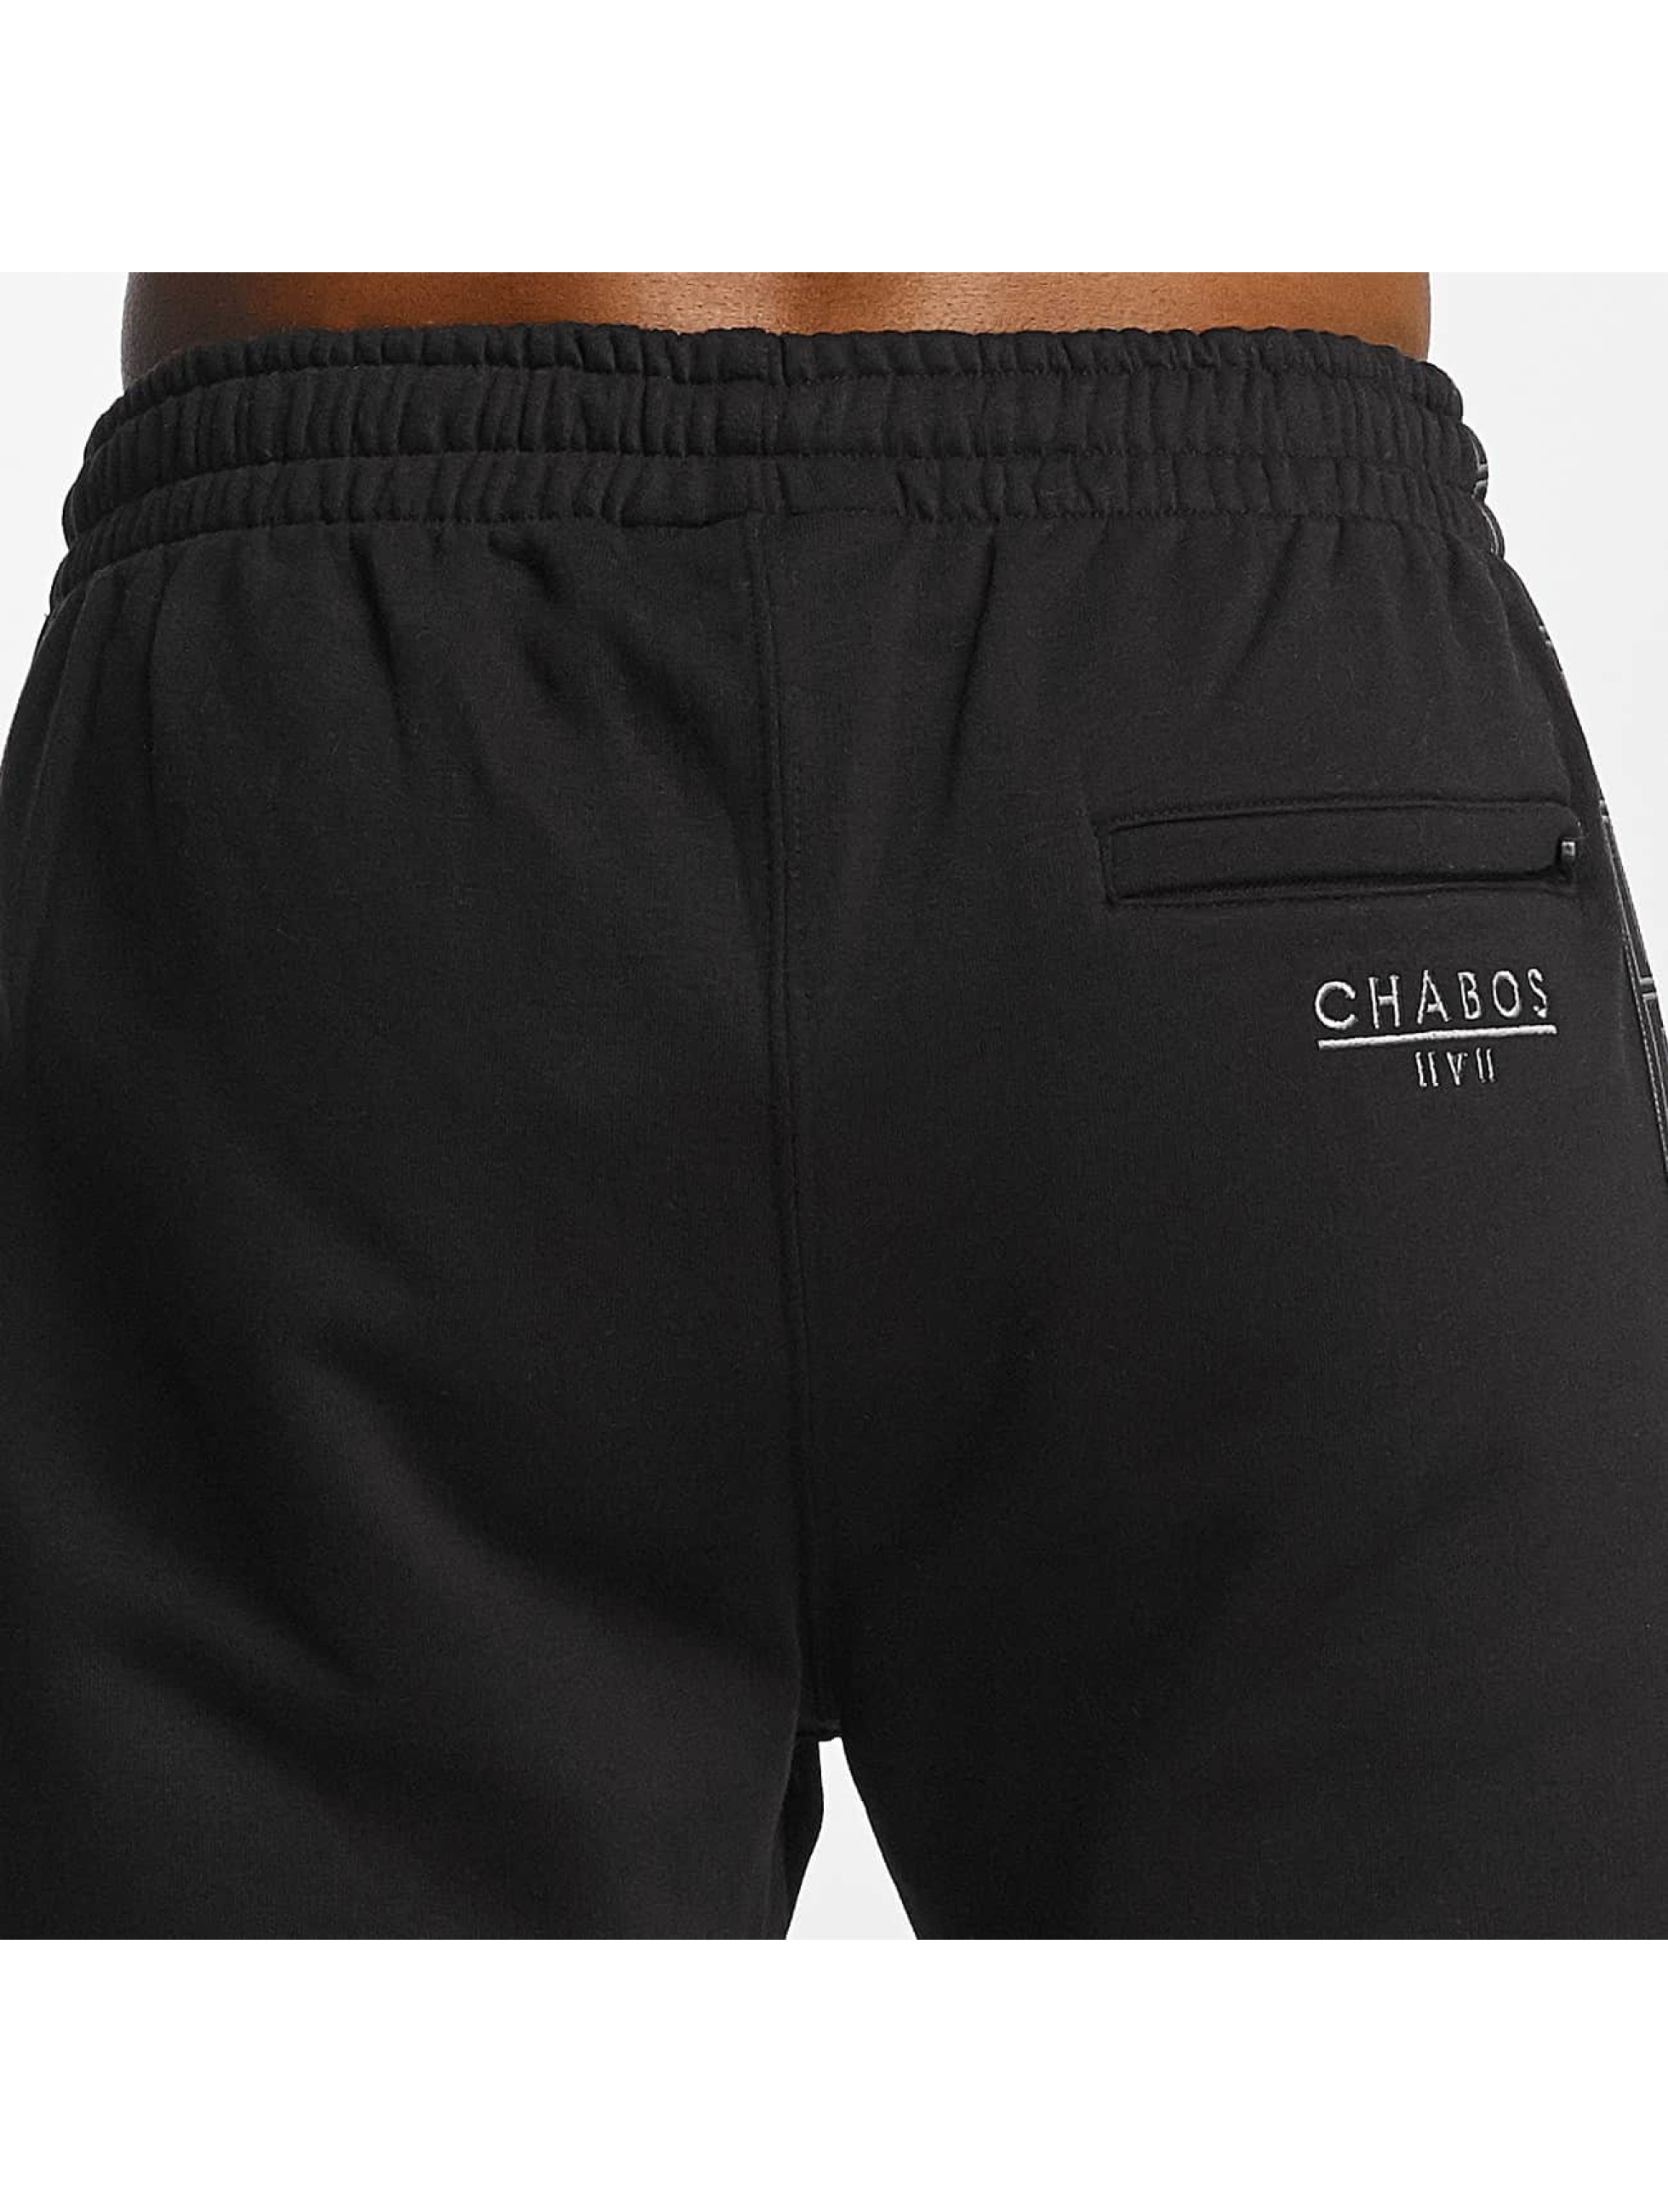 CHABOS IIVII Pantalón deportivo Palazzo Taped negro